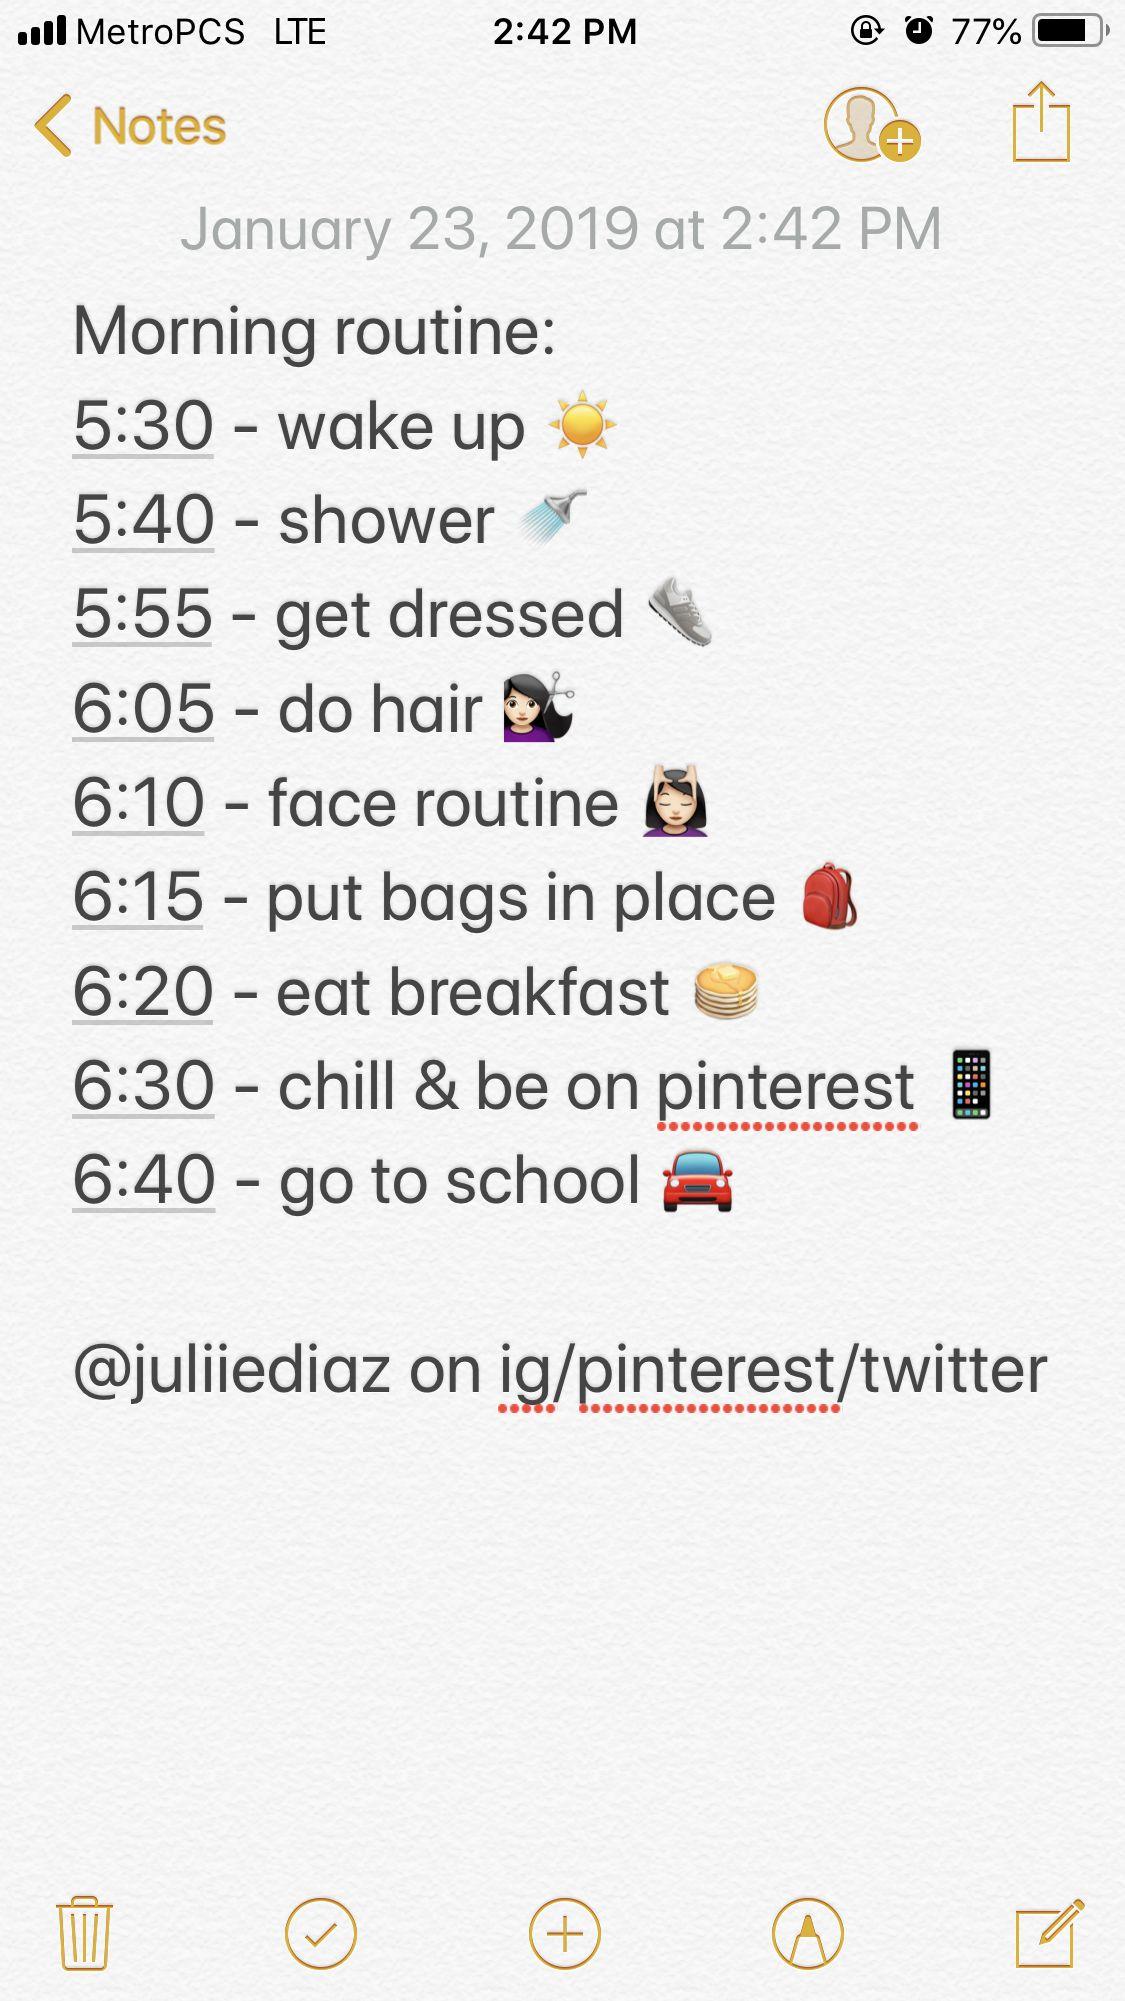 Morningroutine School Highschool Lifestyle